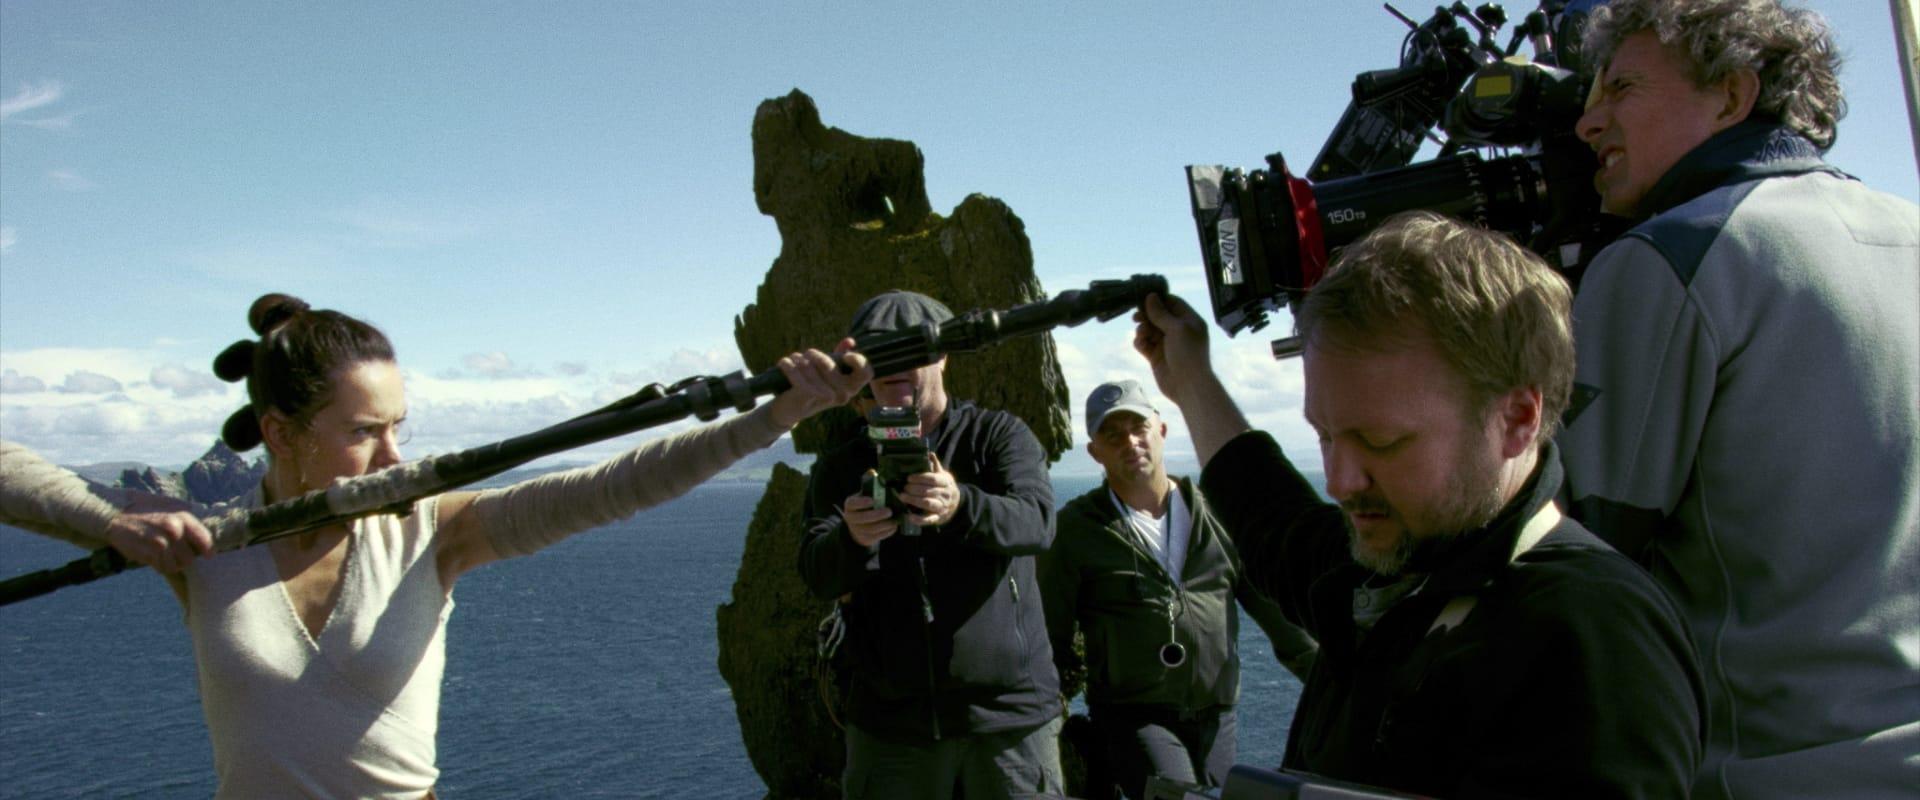 STAR WARS LES DERNIERS JEDI Rian Johnson image tournage 04